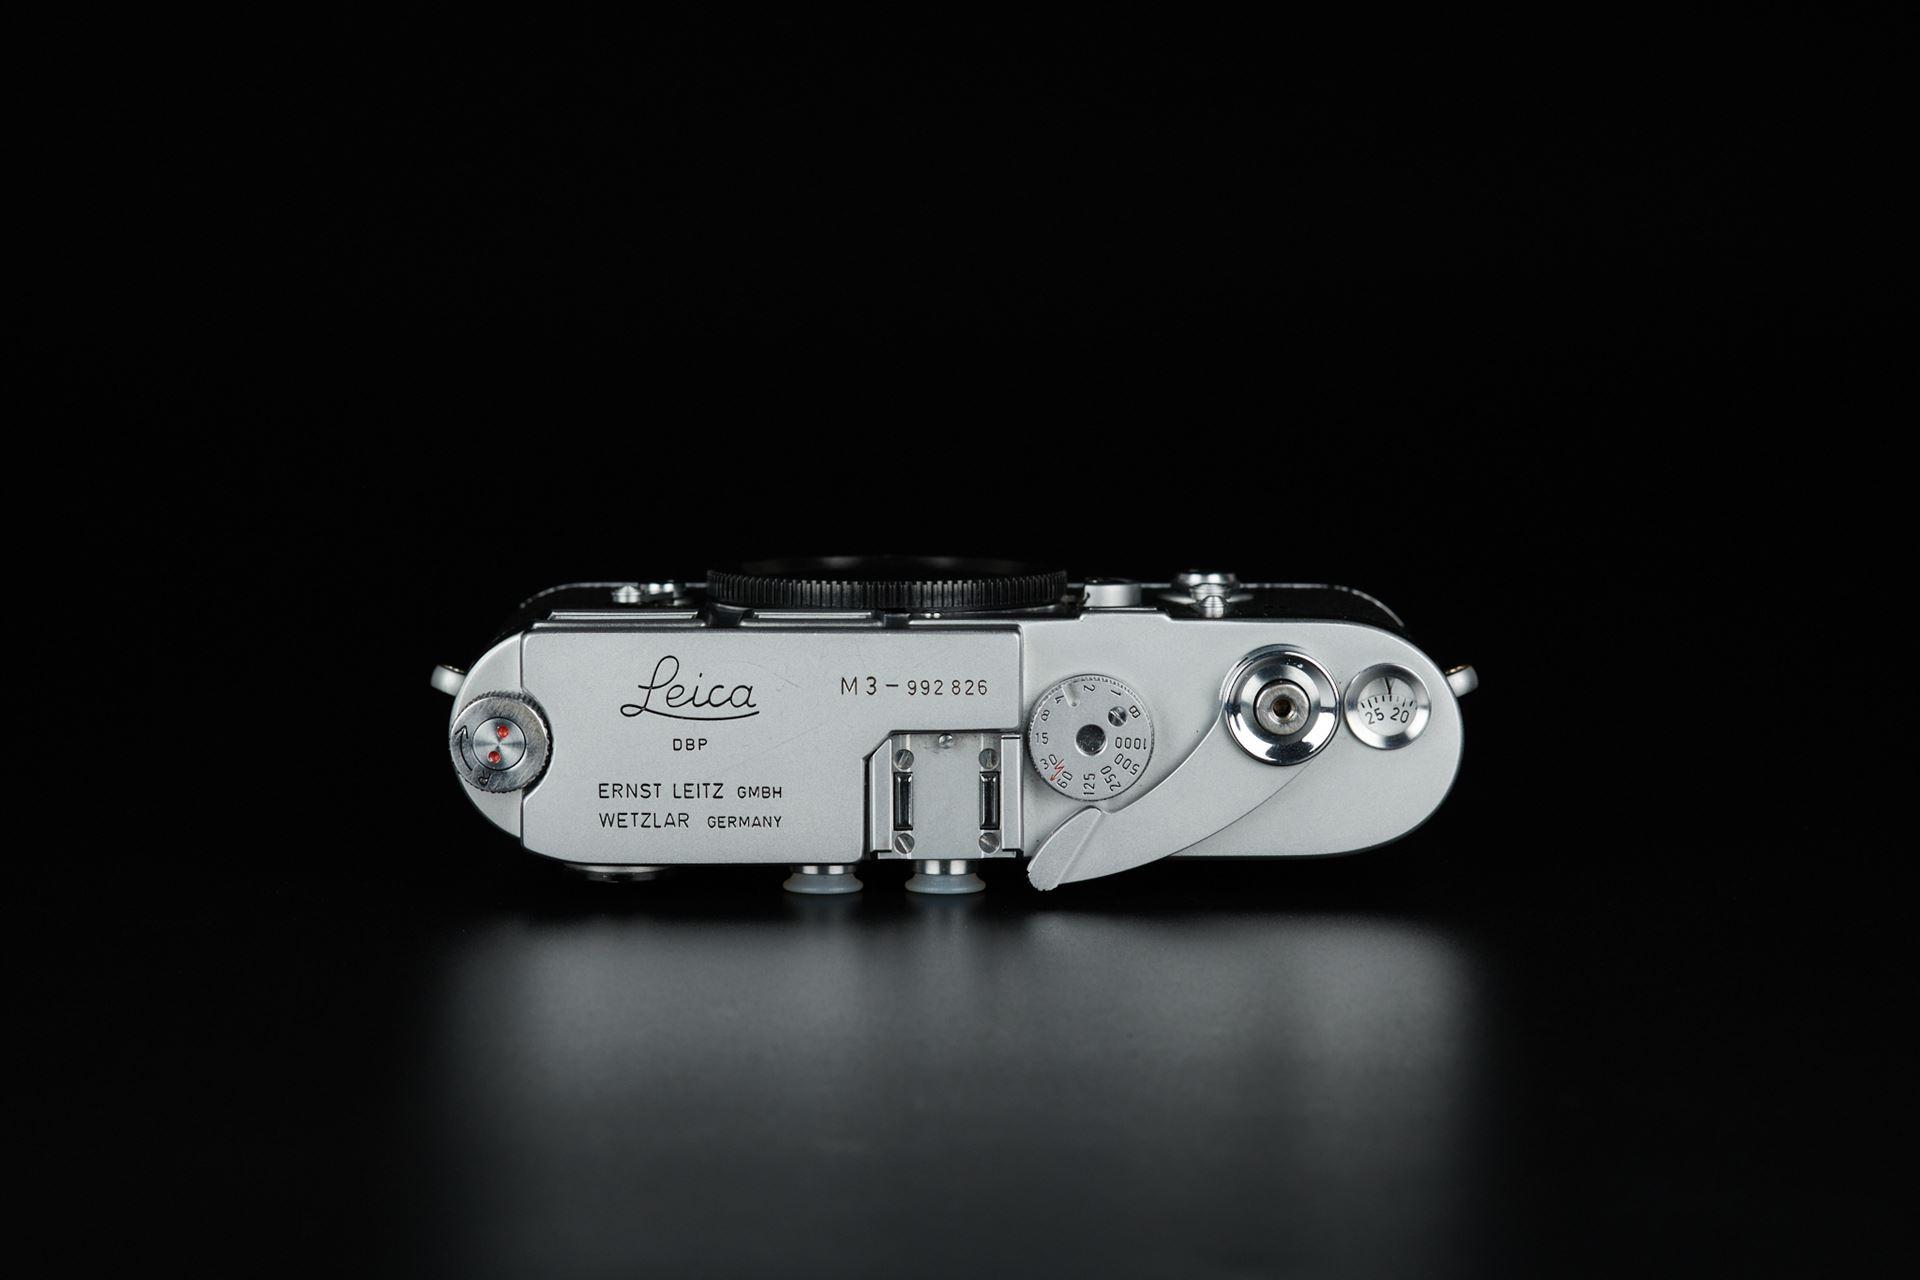 Picture of leica m3 single stroke silver